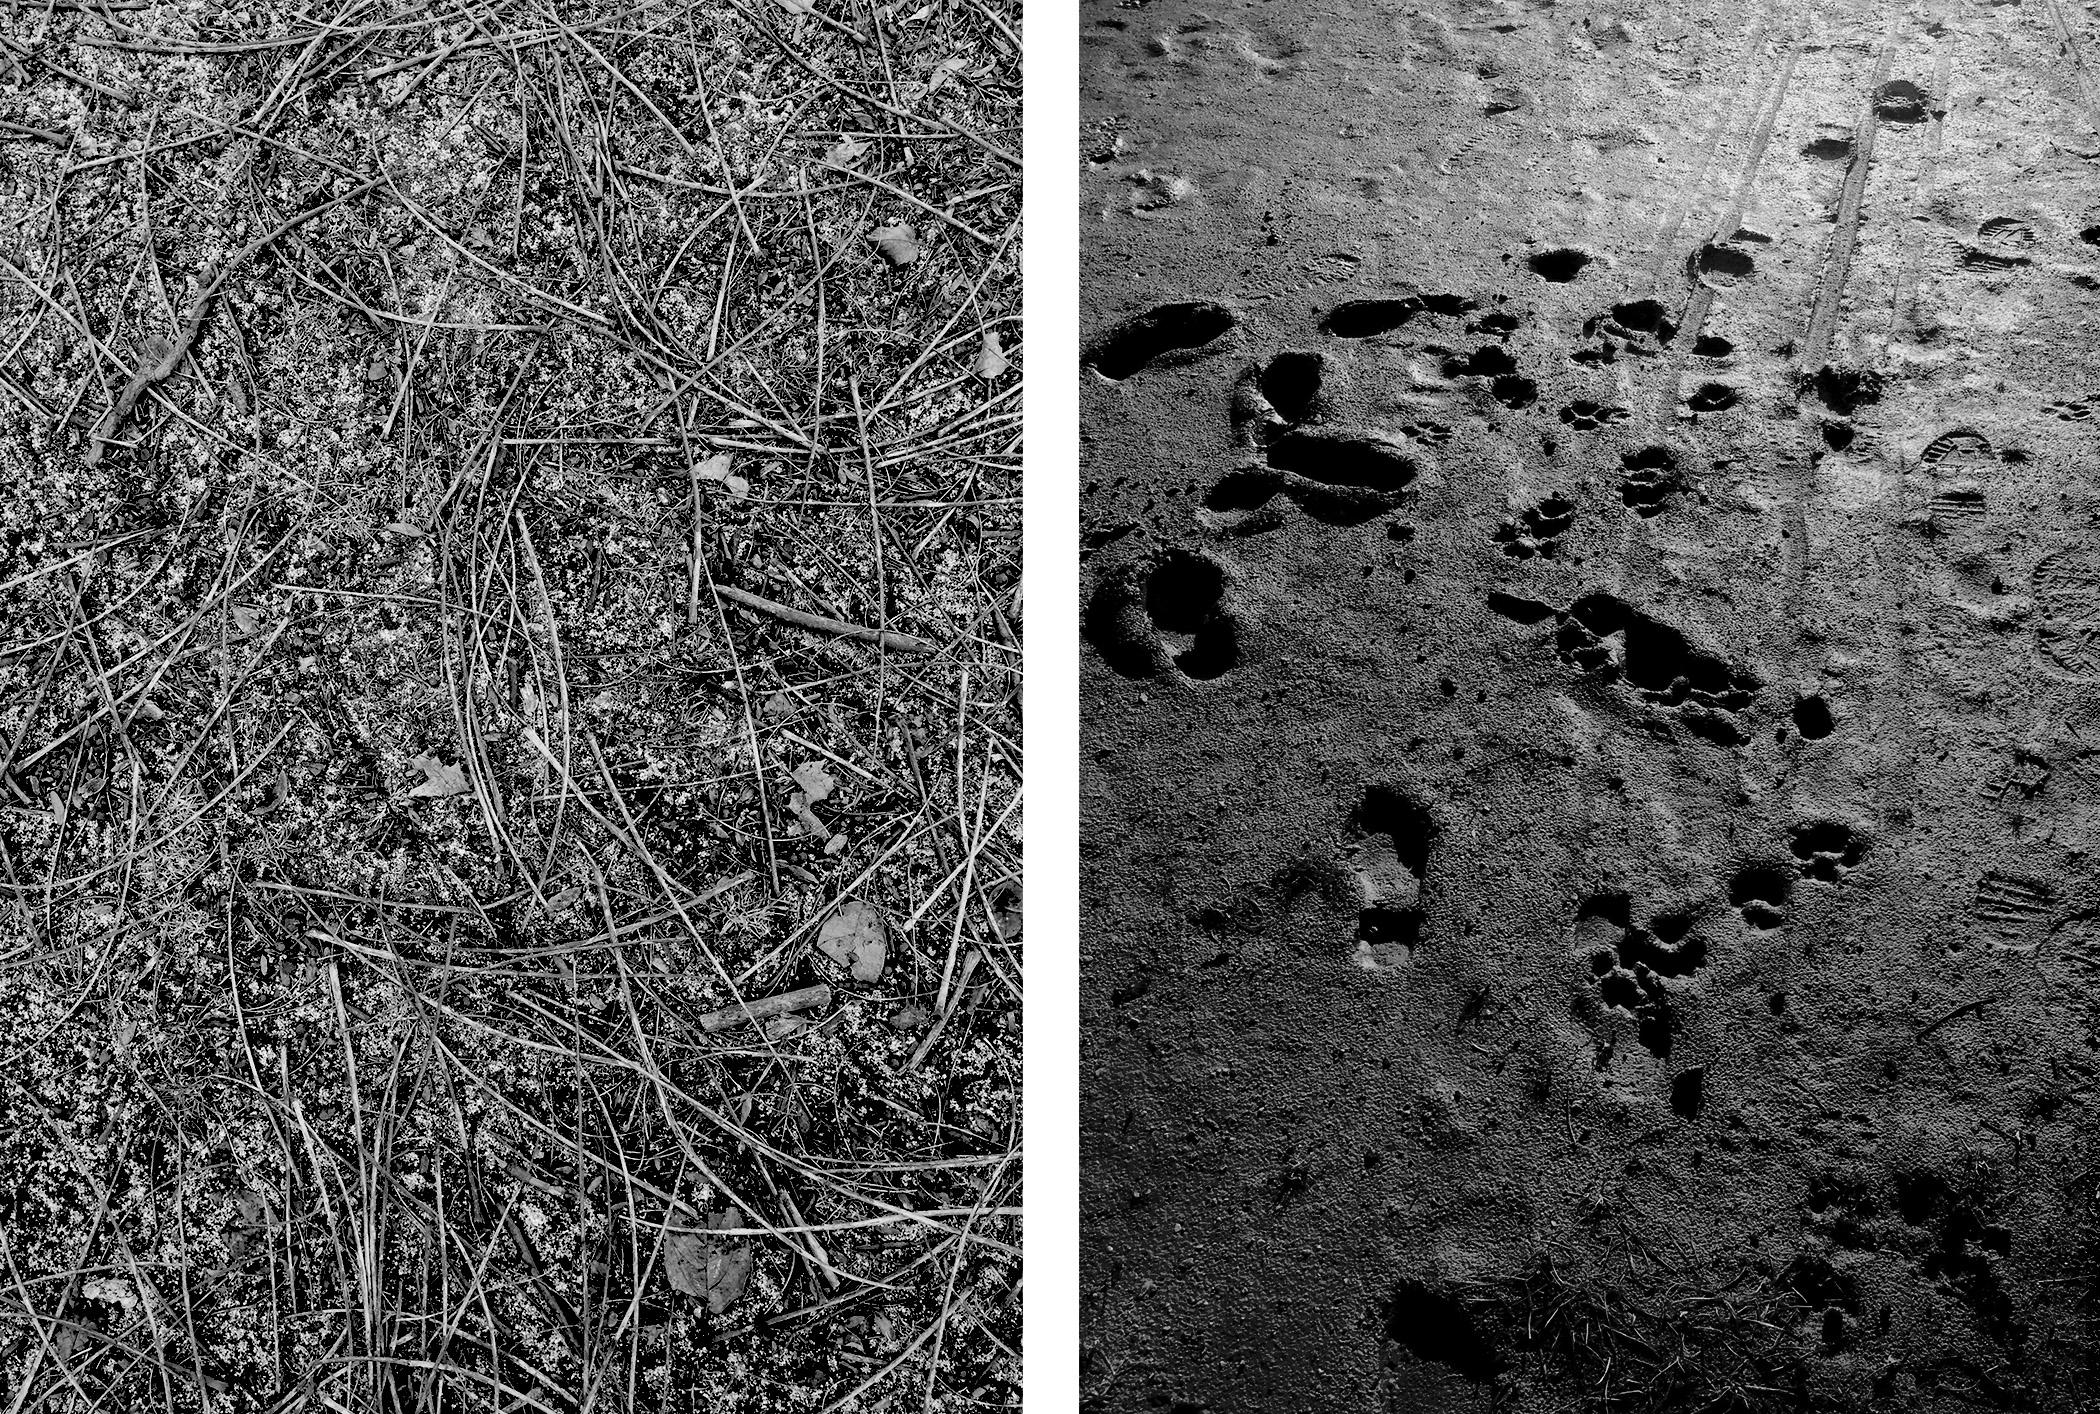 The ground in Welles Park, Chicago Illinois / Darker than Green